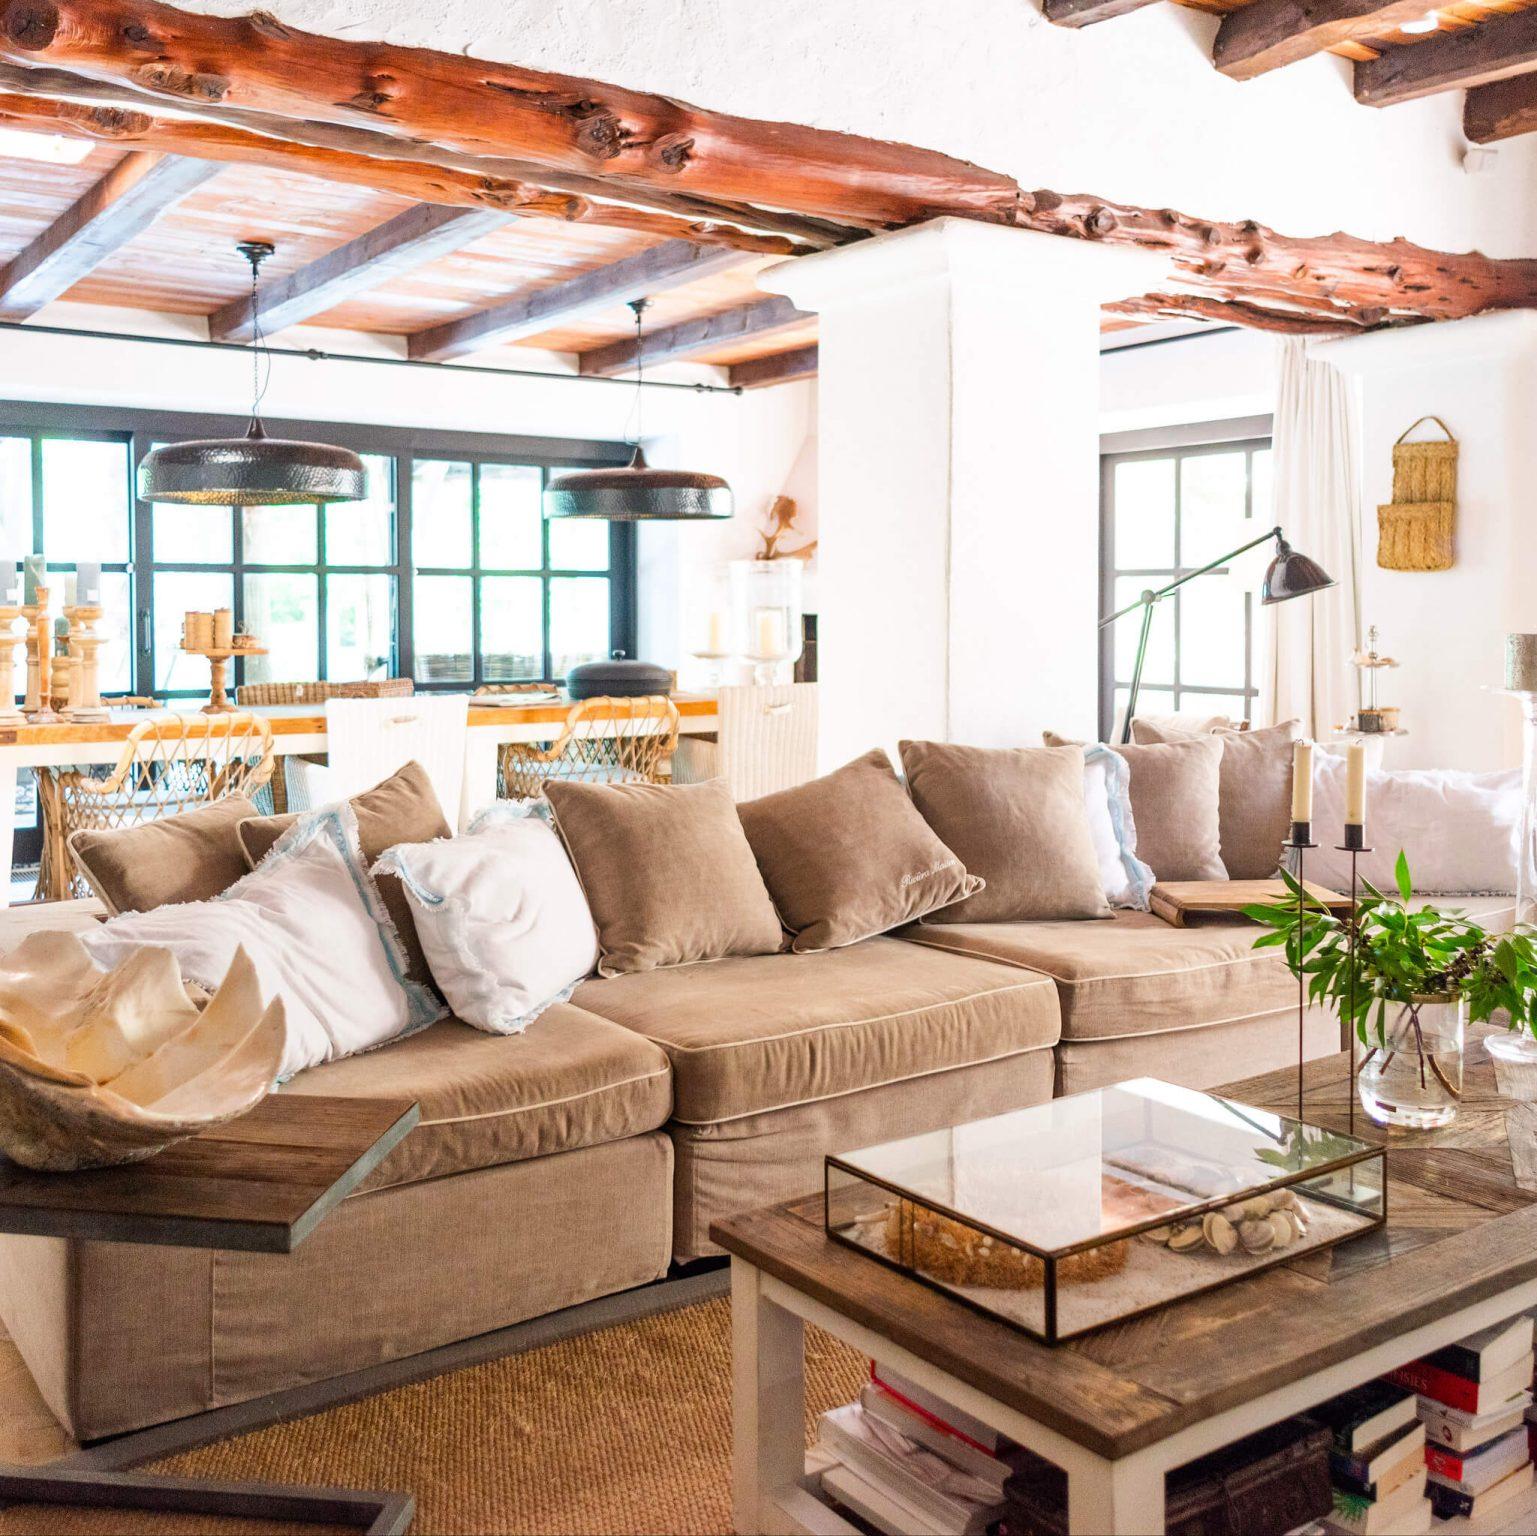 https://www.white-ibiza.com/wp-content/uploads/2020/05/white-ibiza-villas-can-riviere-interior-living-room-1537x1536.jpg